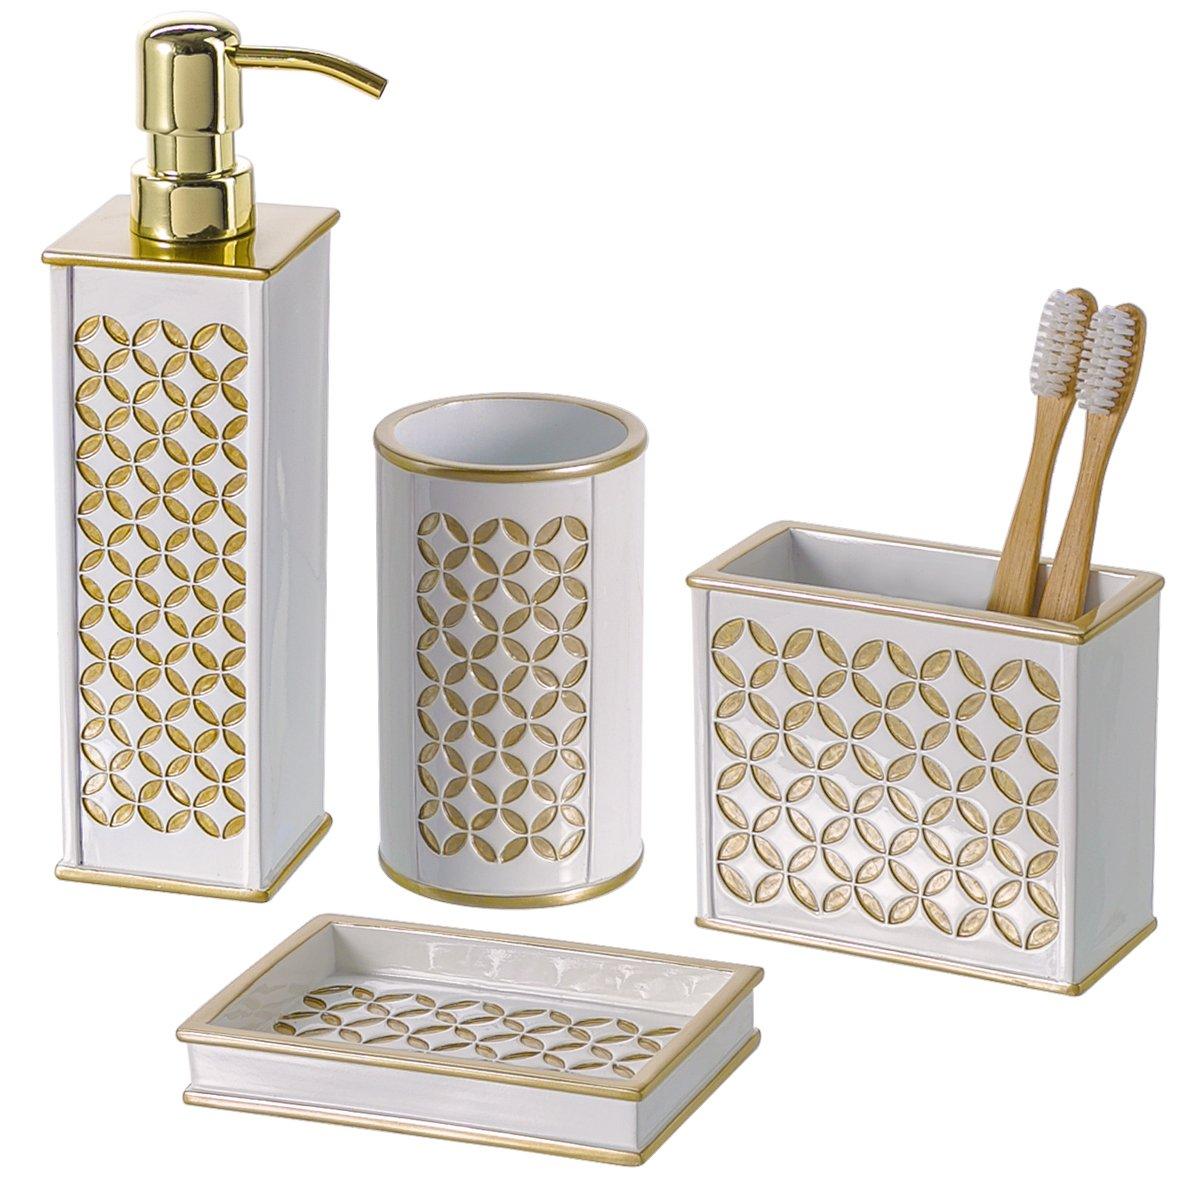 Decorative Bathroom Accessories Sets | Home Decor & Renovation Ideas